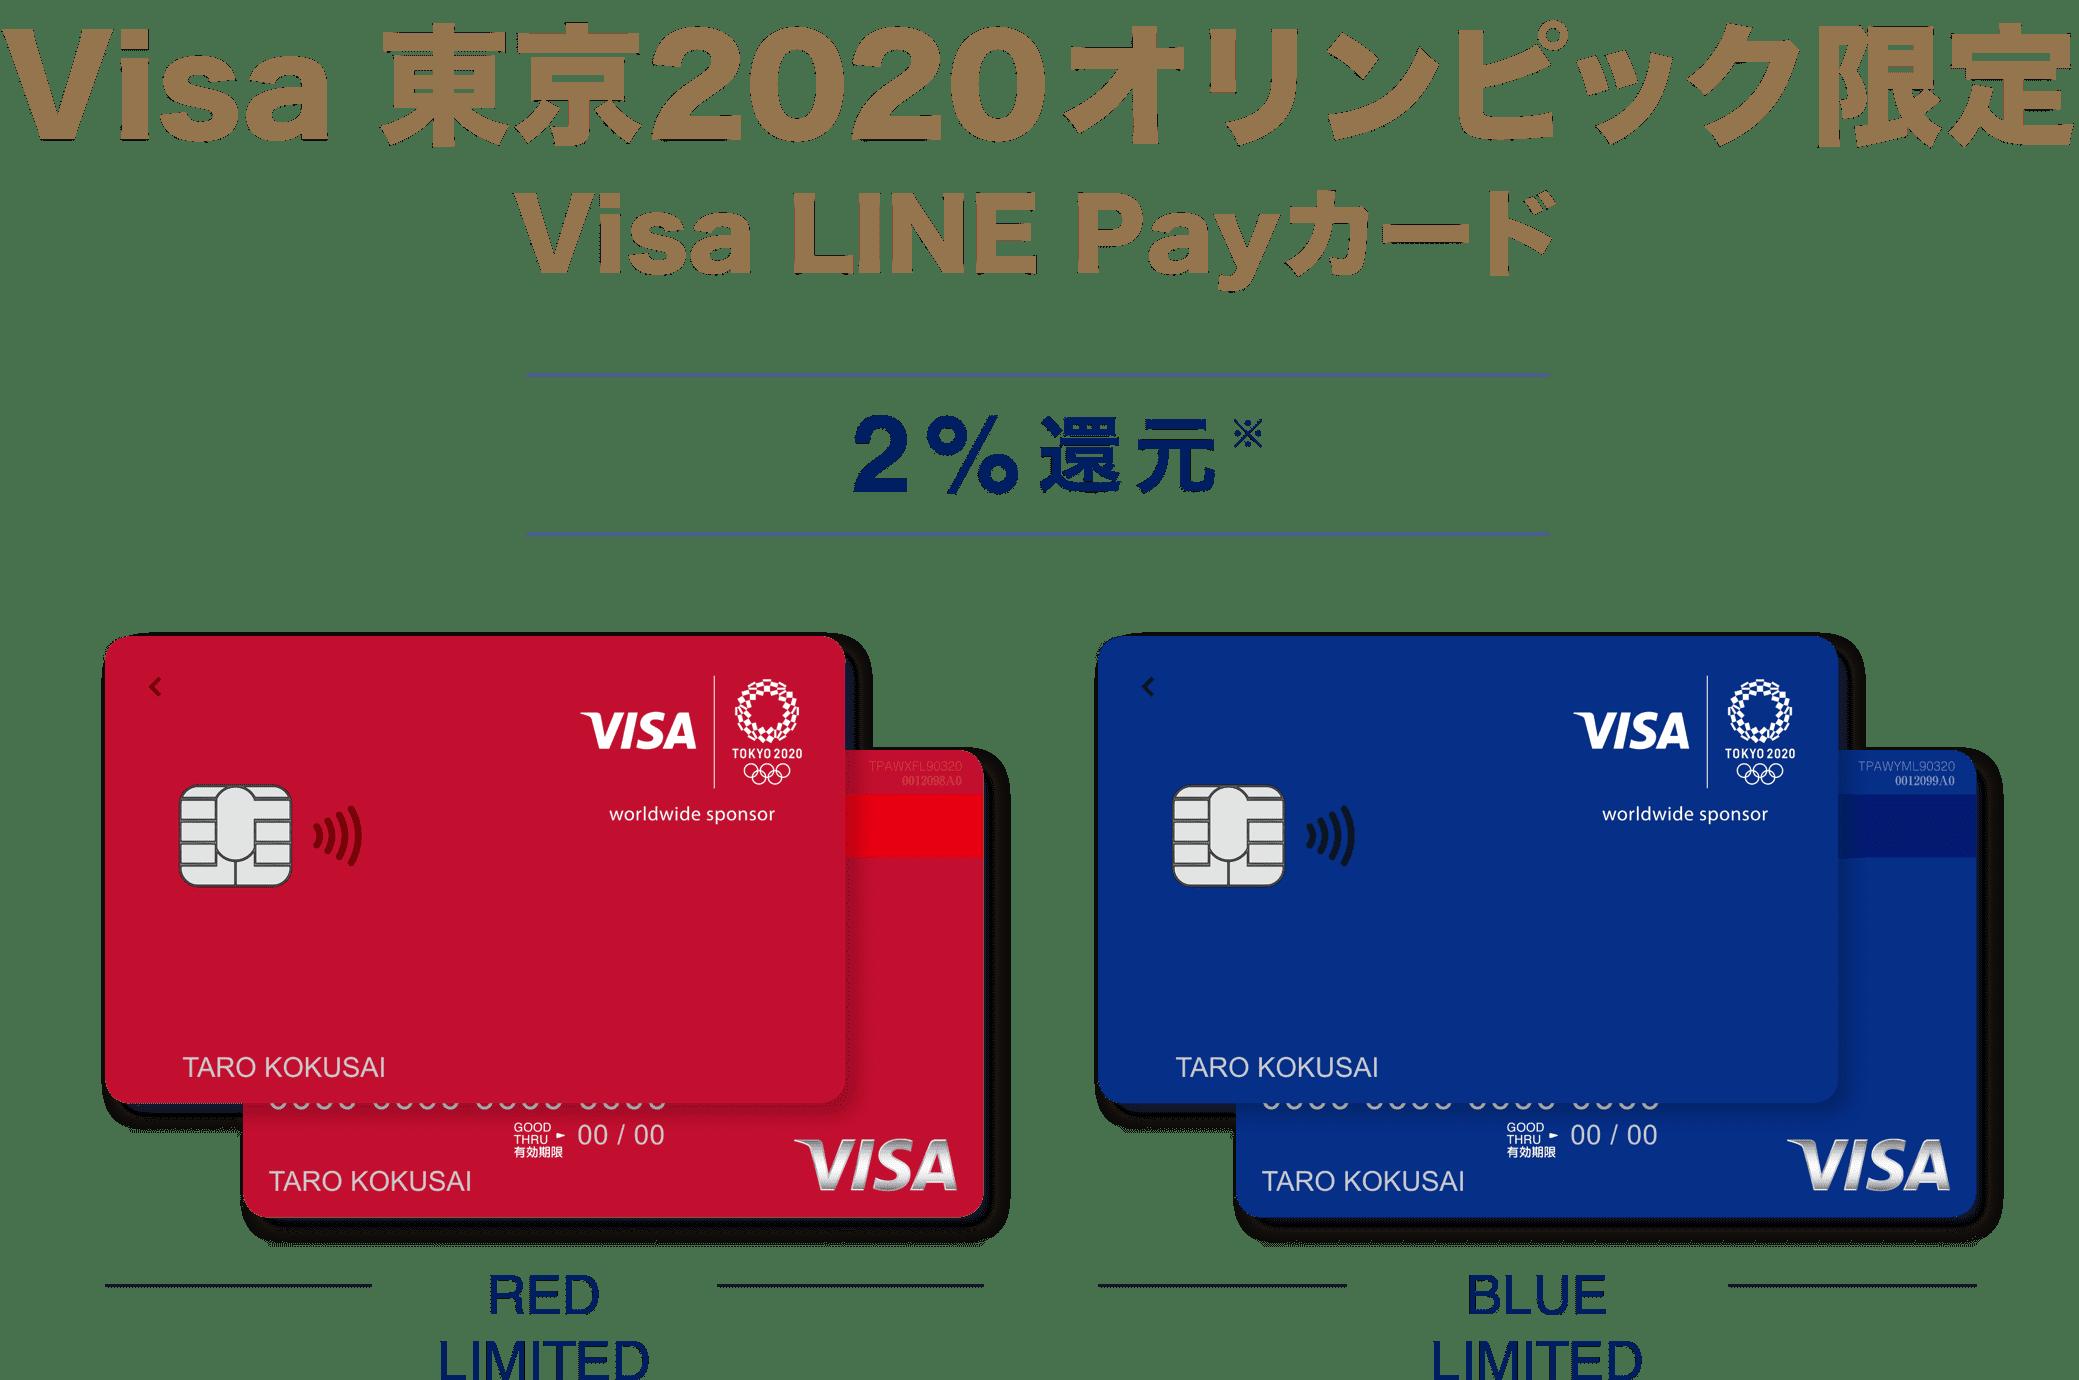 Visa 東京2020オリンピック限定 Visa LINE Payカード 2%還元※